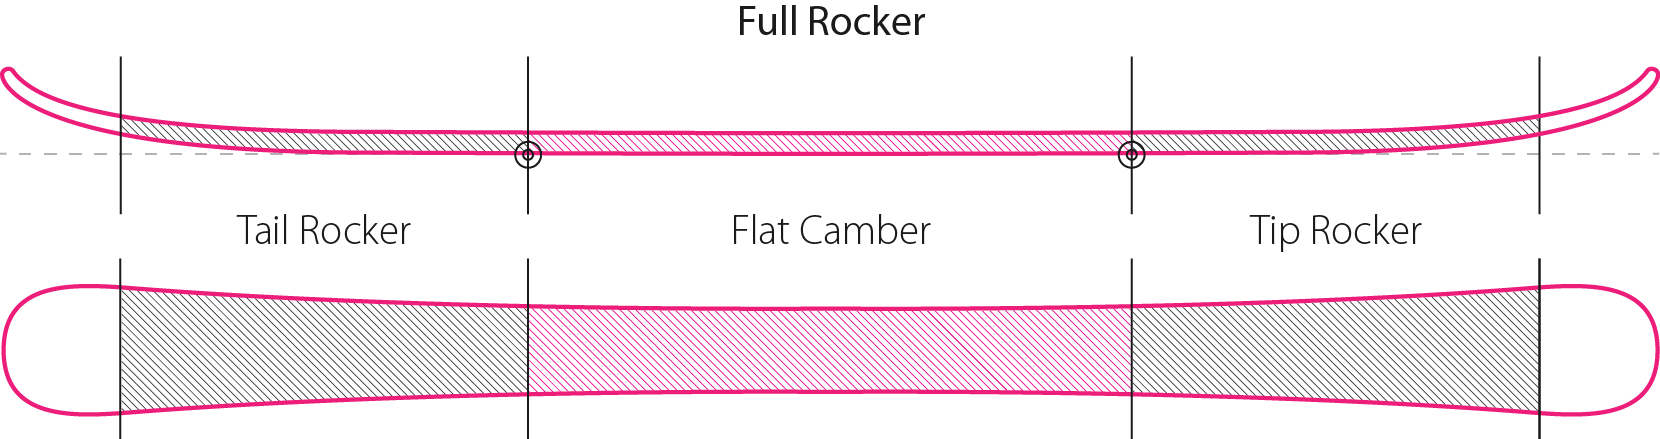 Full Rocker